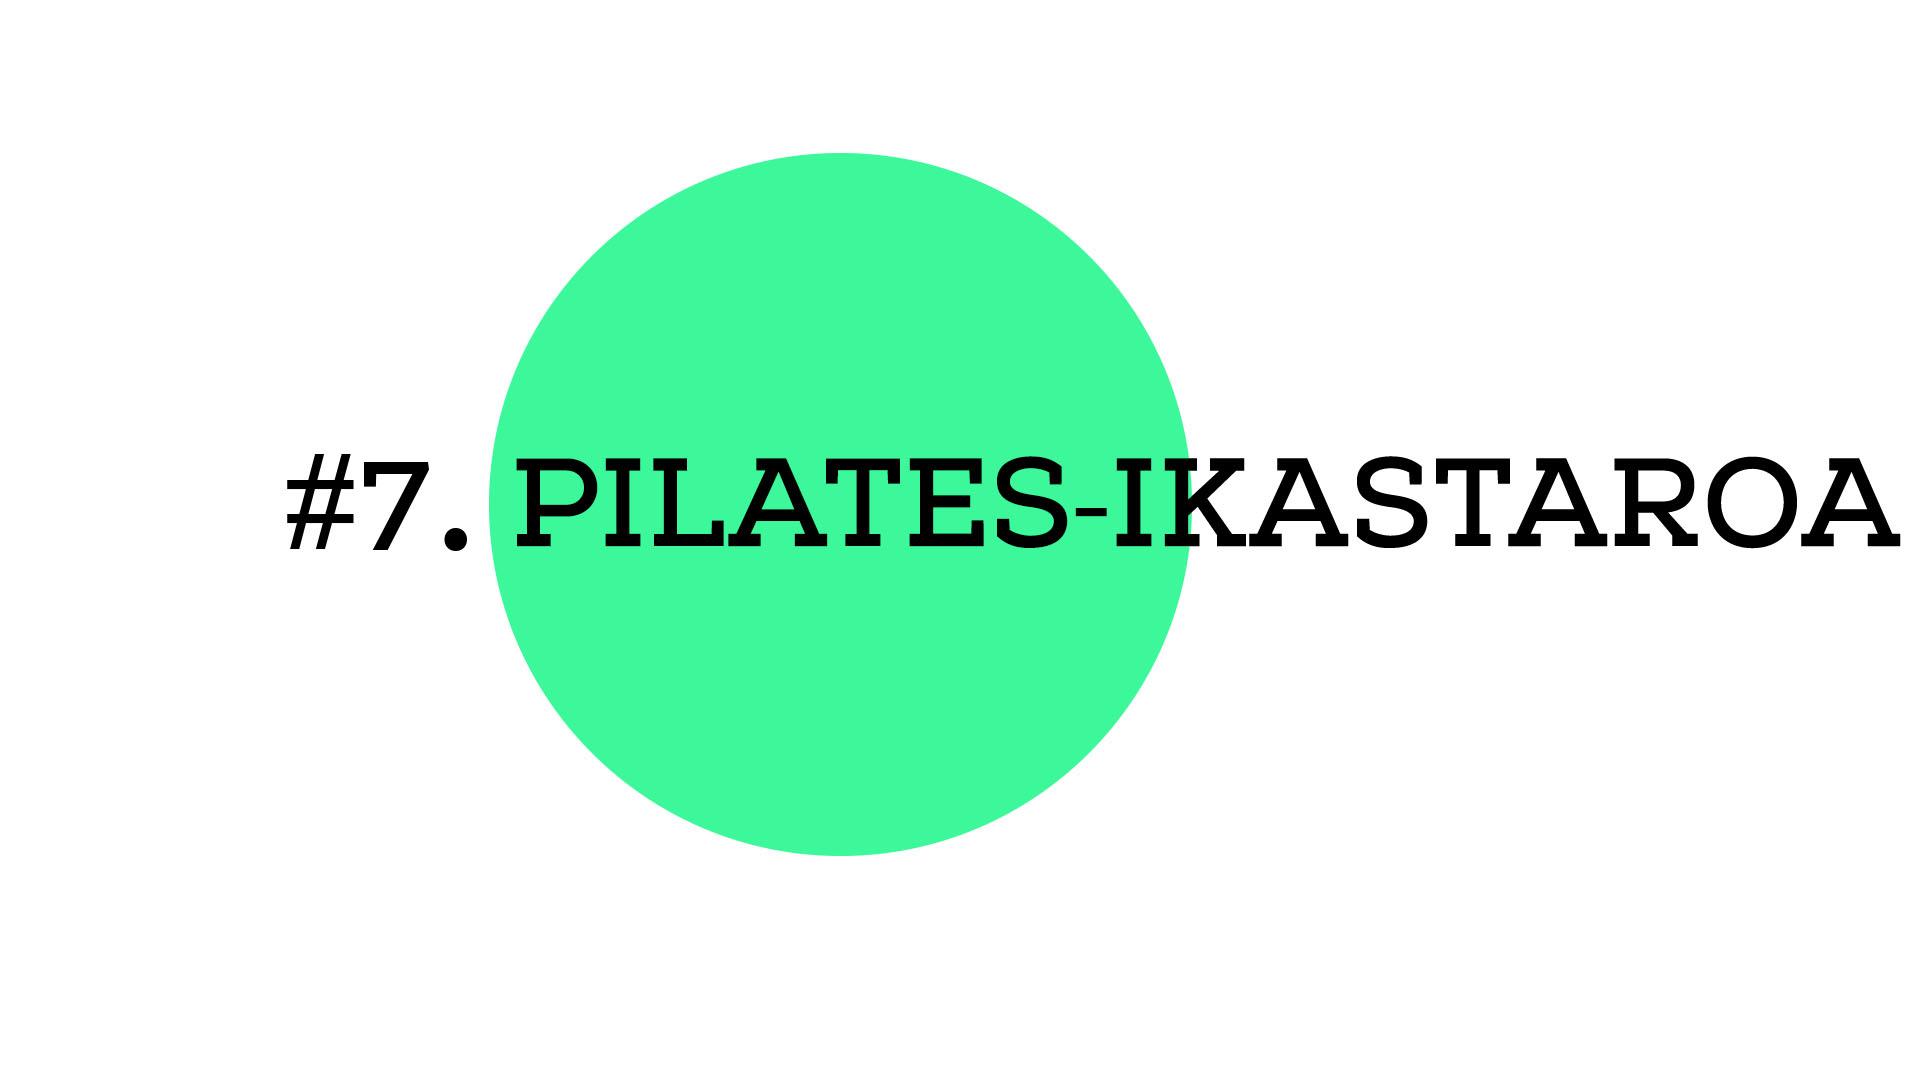 Pilates-ikastaroa (A1E07)